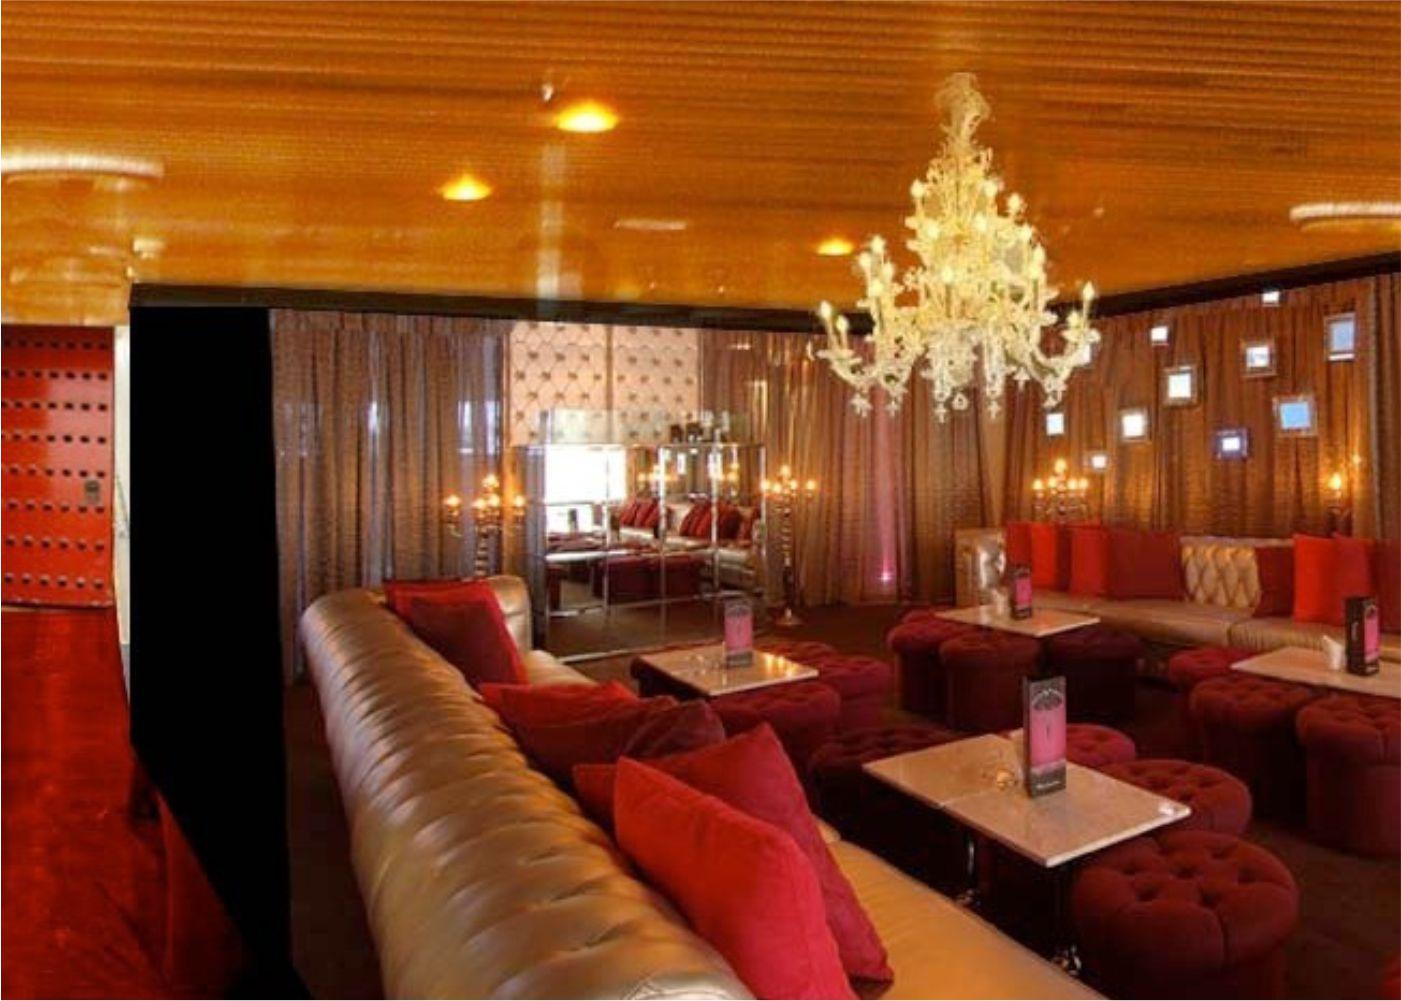 Paraskevi-interior-design-fdiamond-1